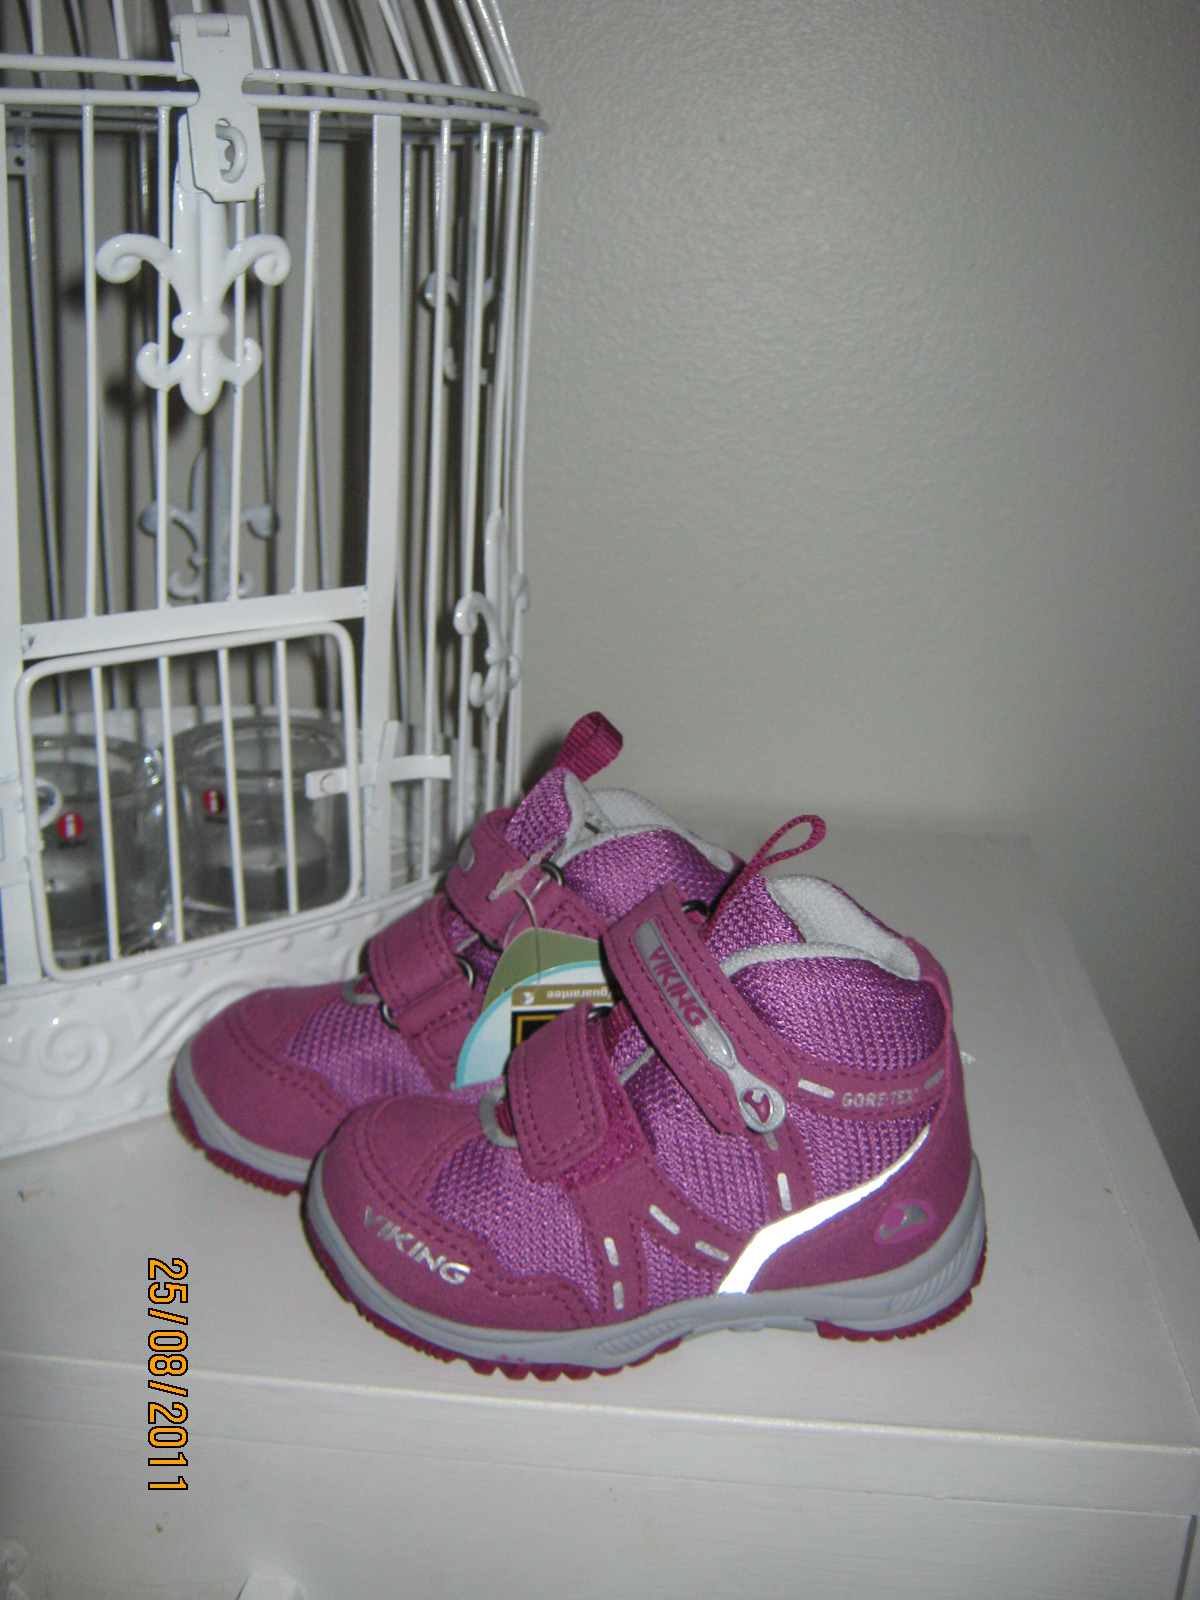 goretex kengät kokemuksia